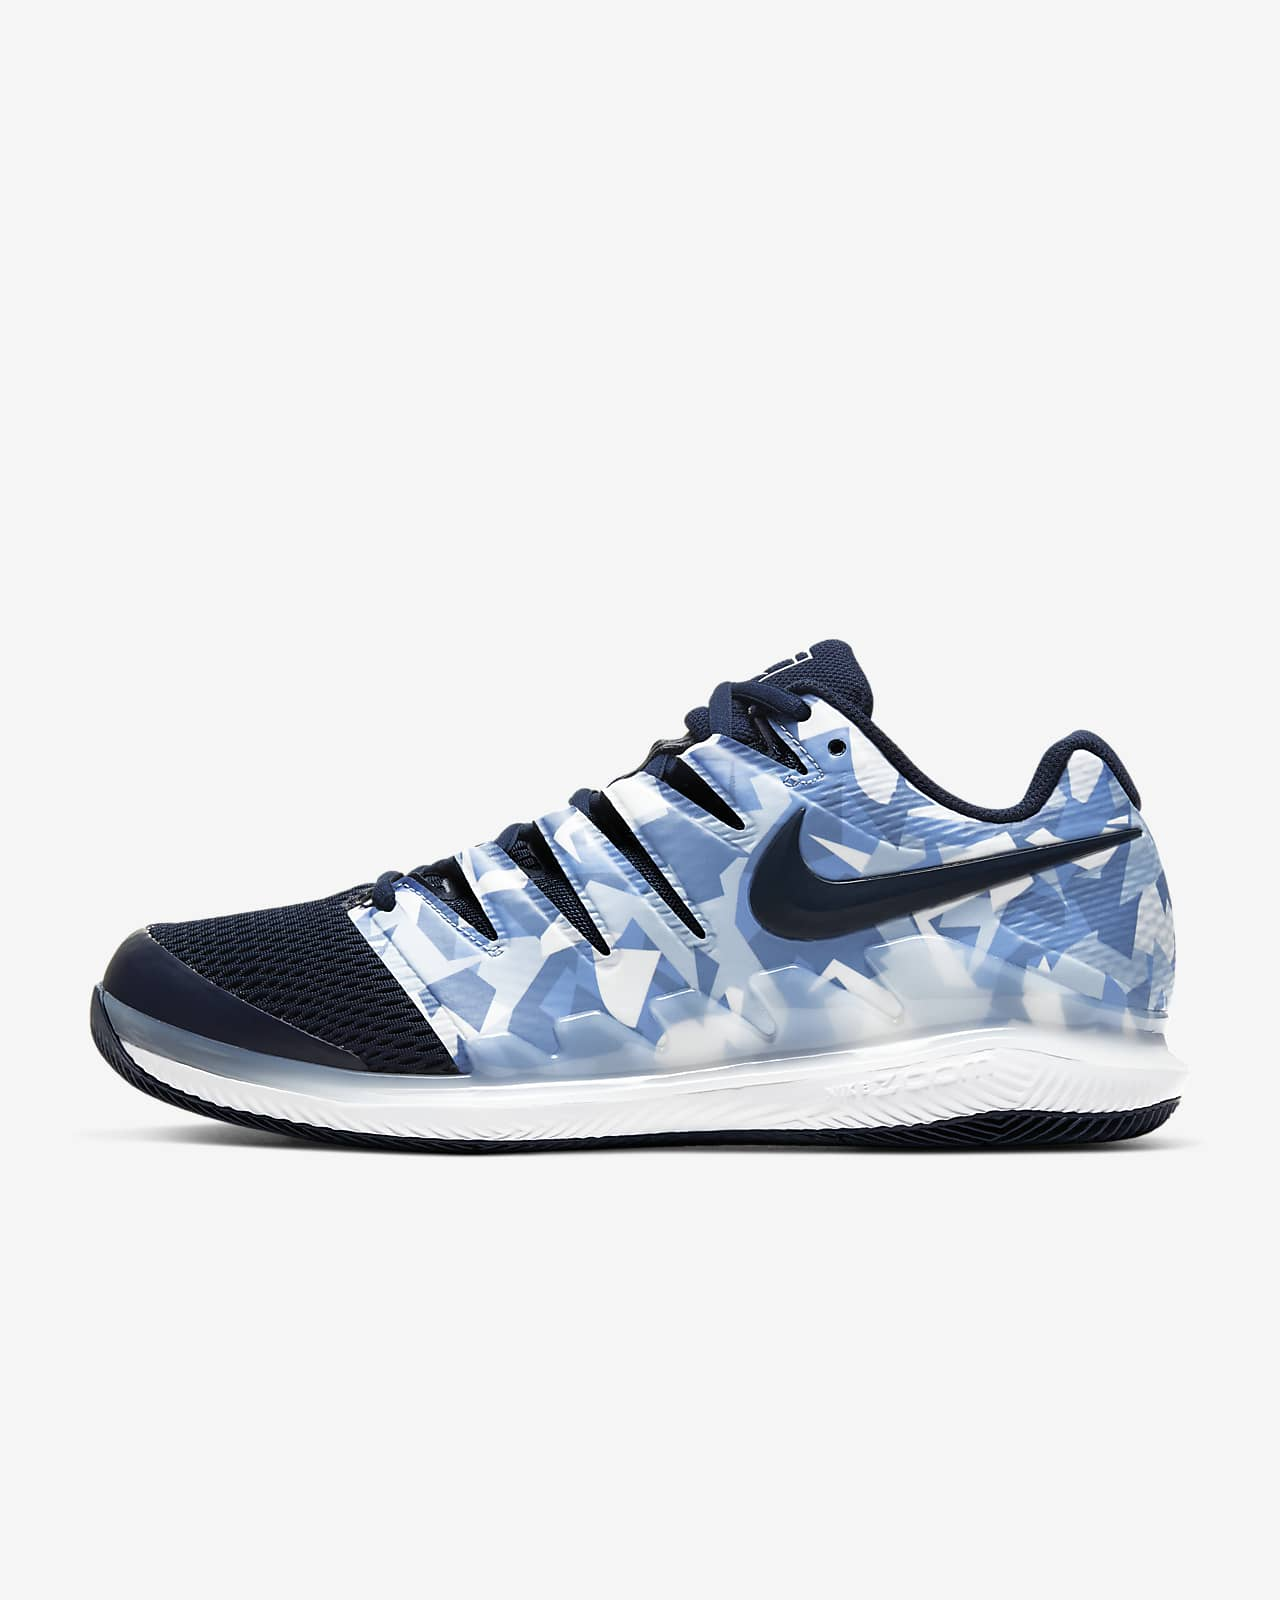 NikeCourt Air Zoom Vapor X 男款硬地球場網球鞋